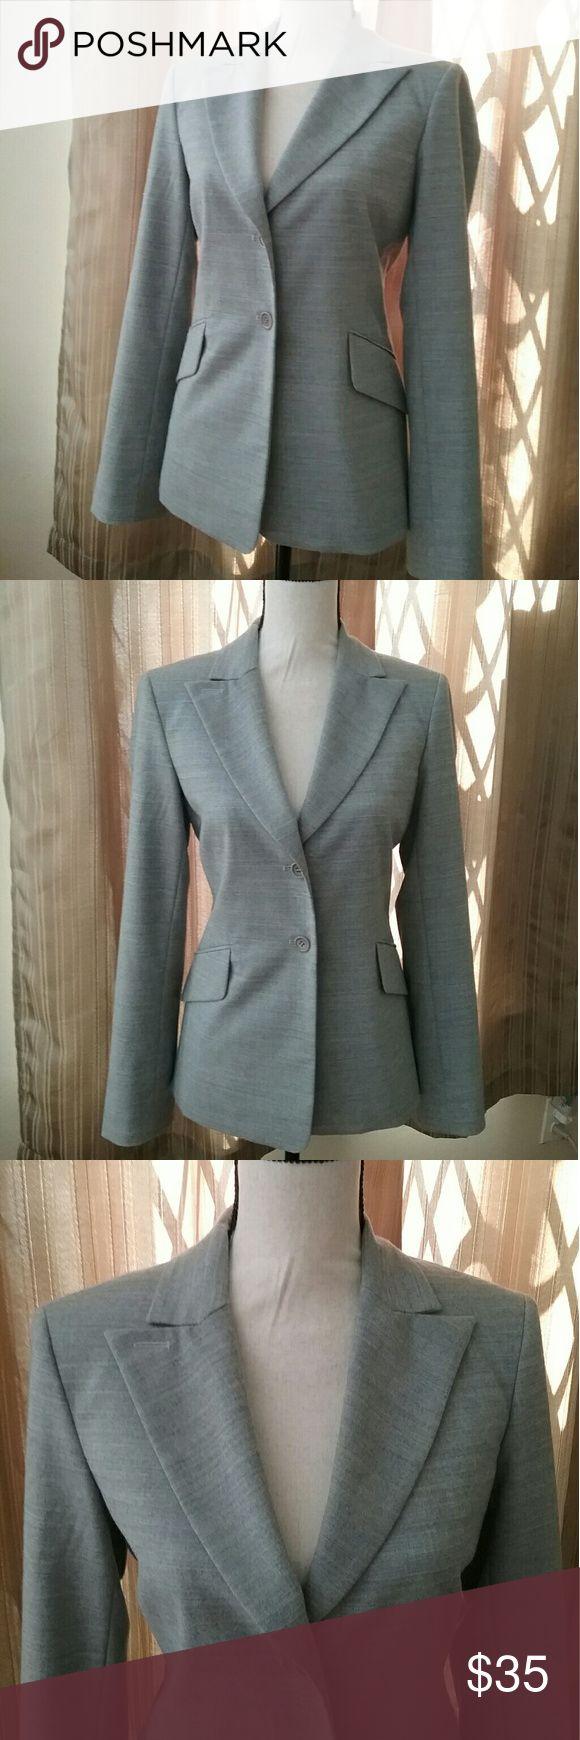 "BCBGMAXAZRIA Jacket Blazer Light gray BCBGMAXAZRIA blazer. Pre owned, very good condition. Can be worn with jeans, skirts or dresses. Measurements: Armpit to armpit 19"" Sleeve length 24"" Length 25"" BCBGMaxAzria Jackets & Coats Blazers"